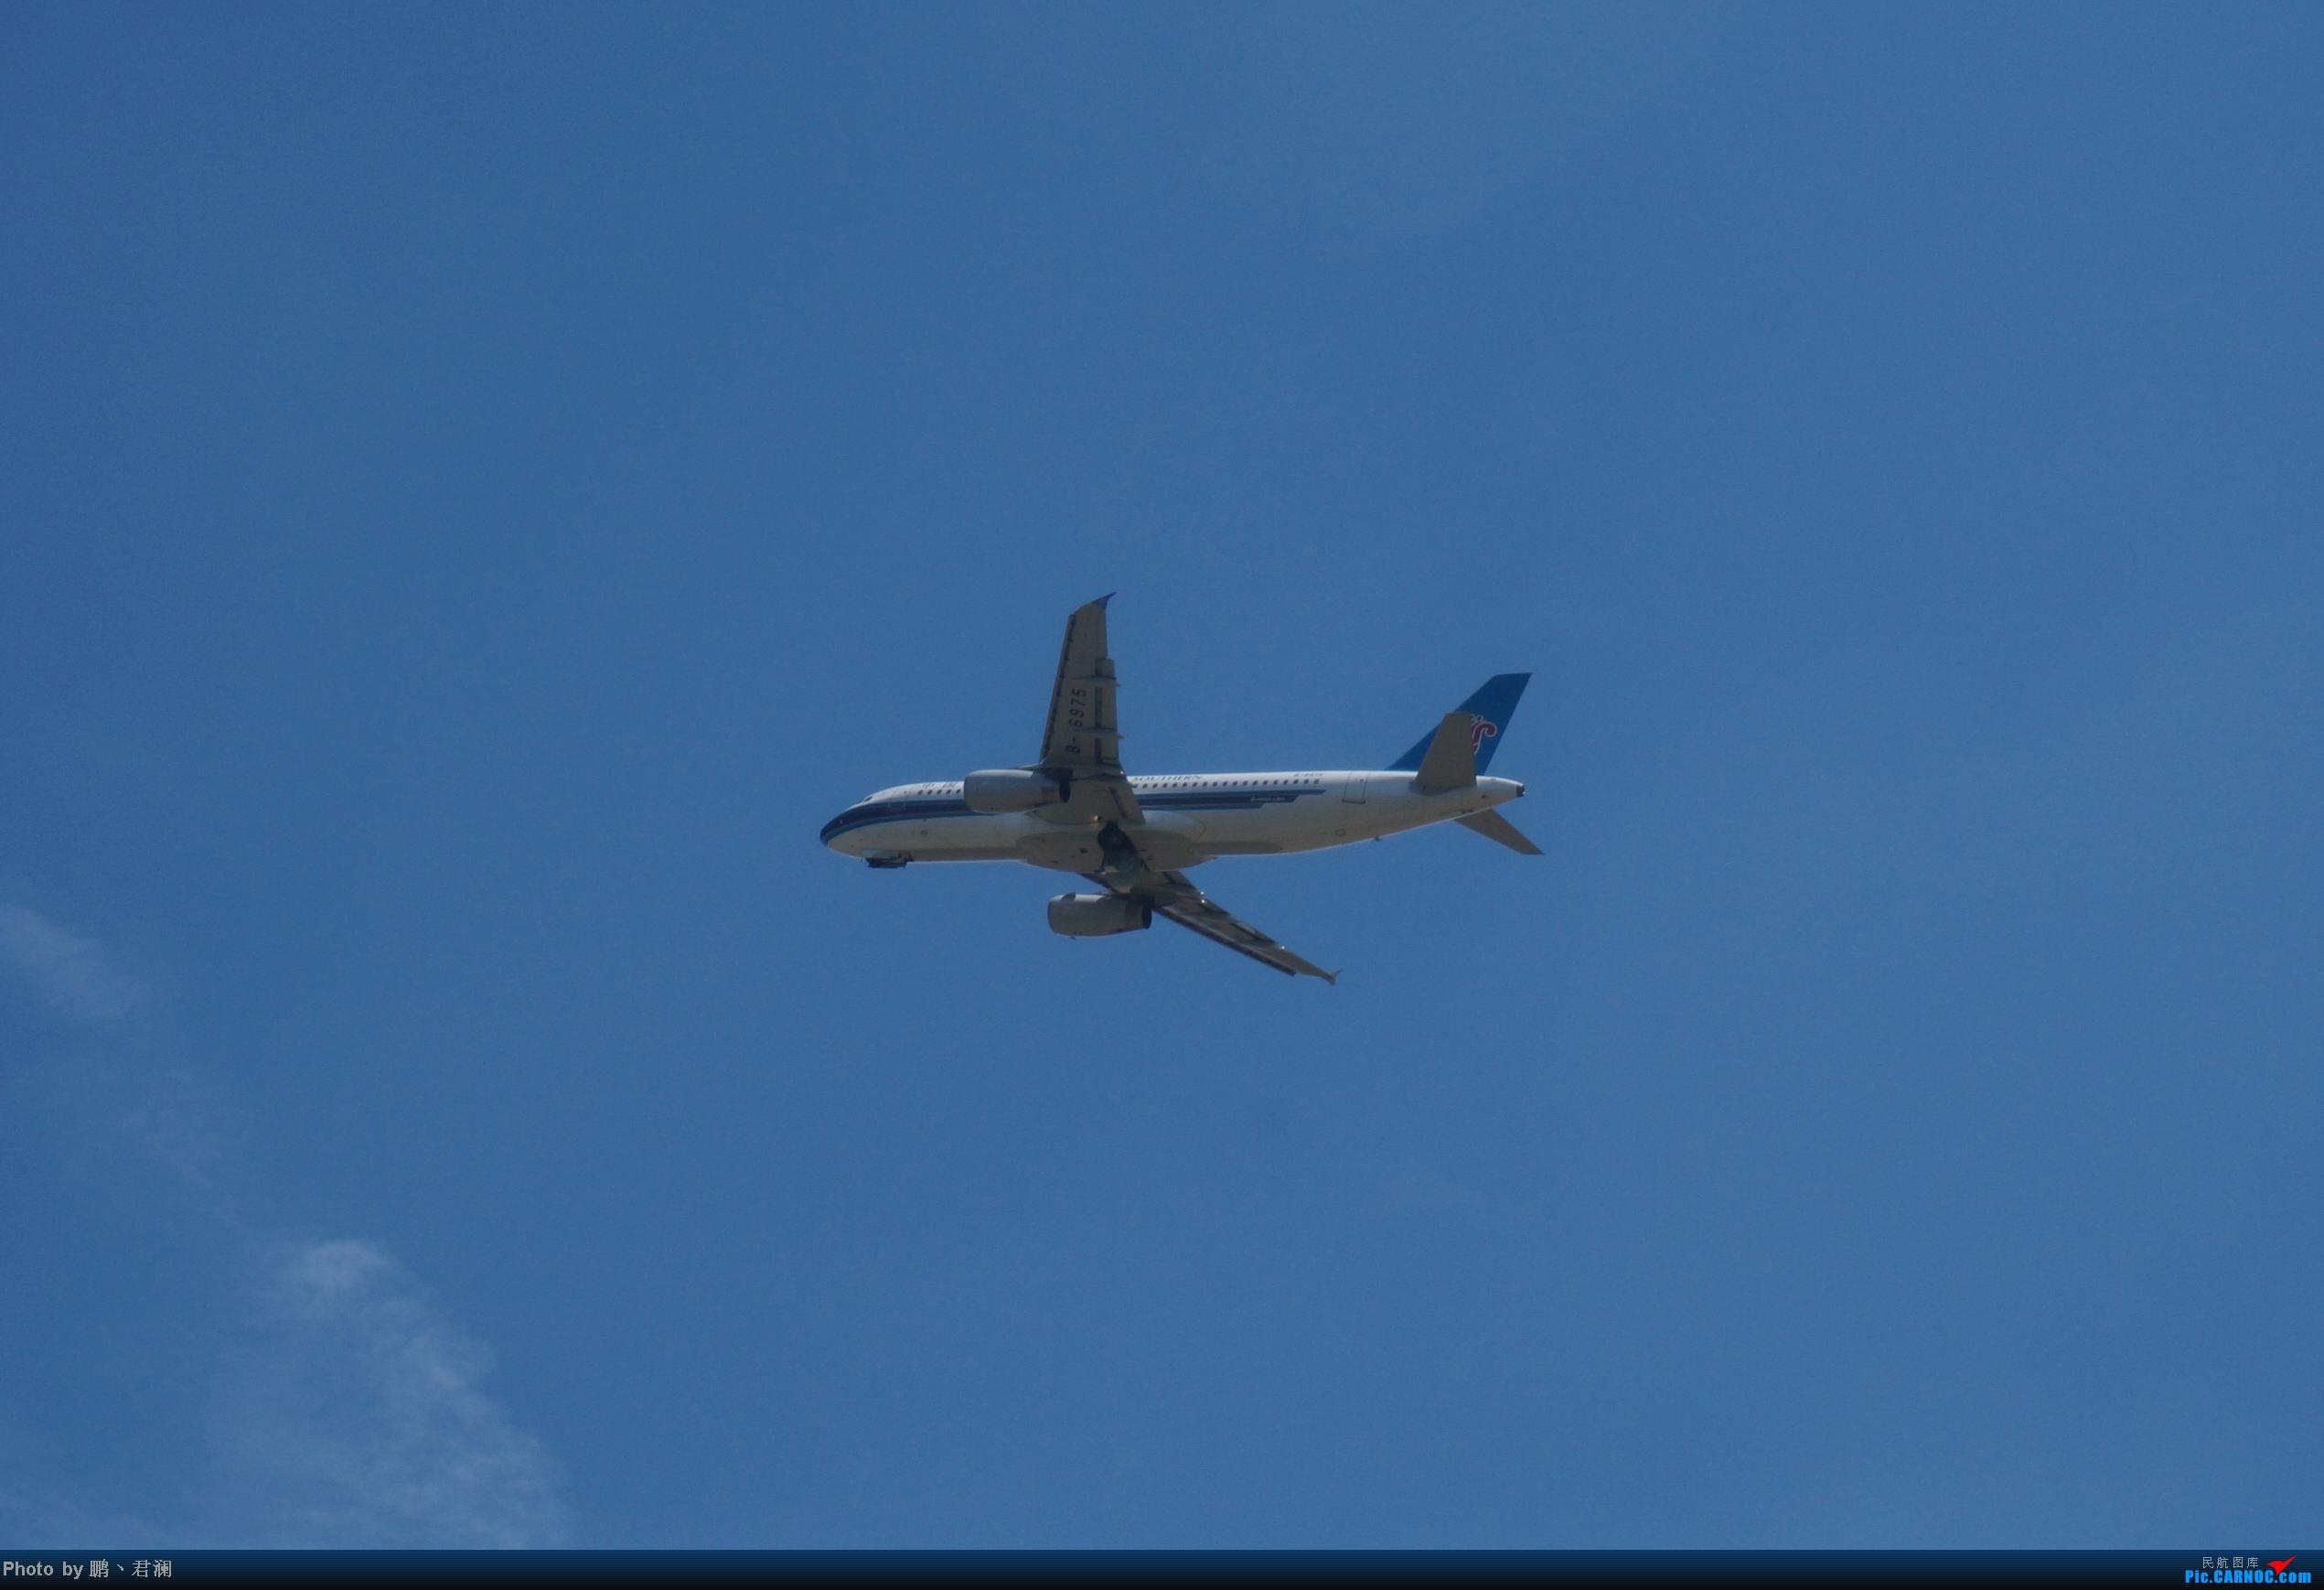 Re:[原创]【海南飞友会】海口炎炎烈日拍机进行时 蓝天+CB+....小微单 AIRBUS A320-200 B-6975 中国海口美兰机场